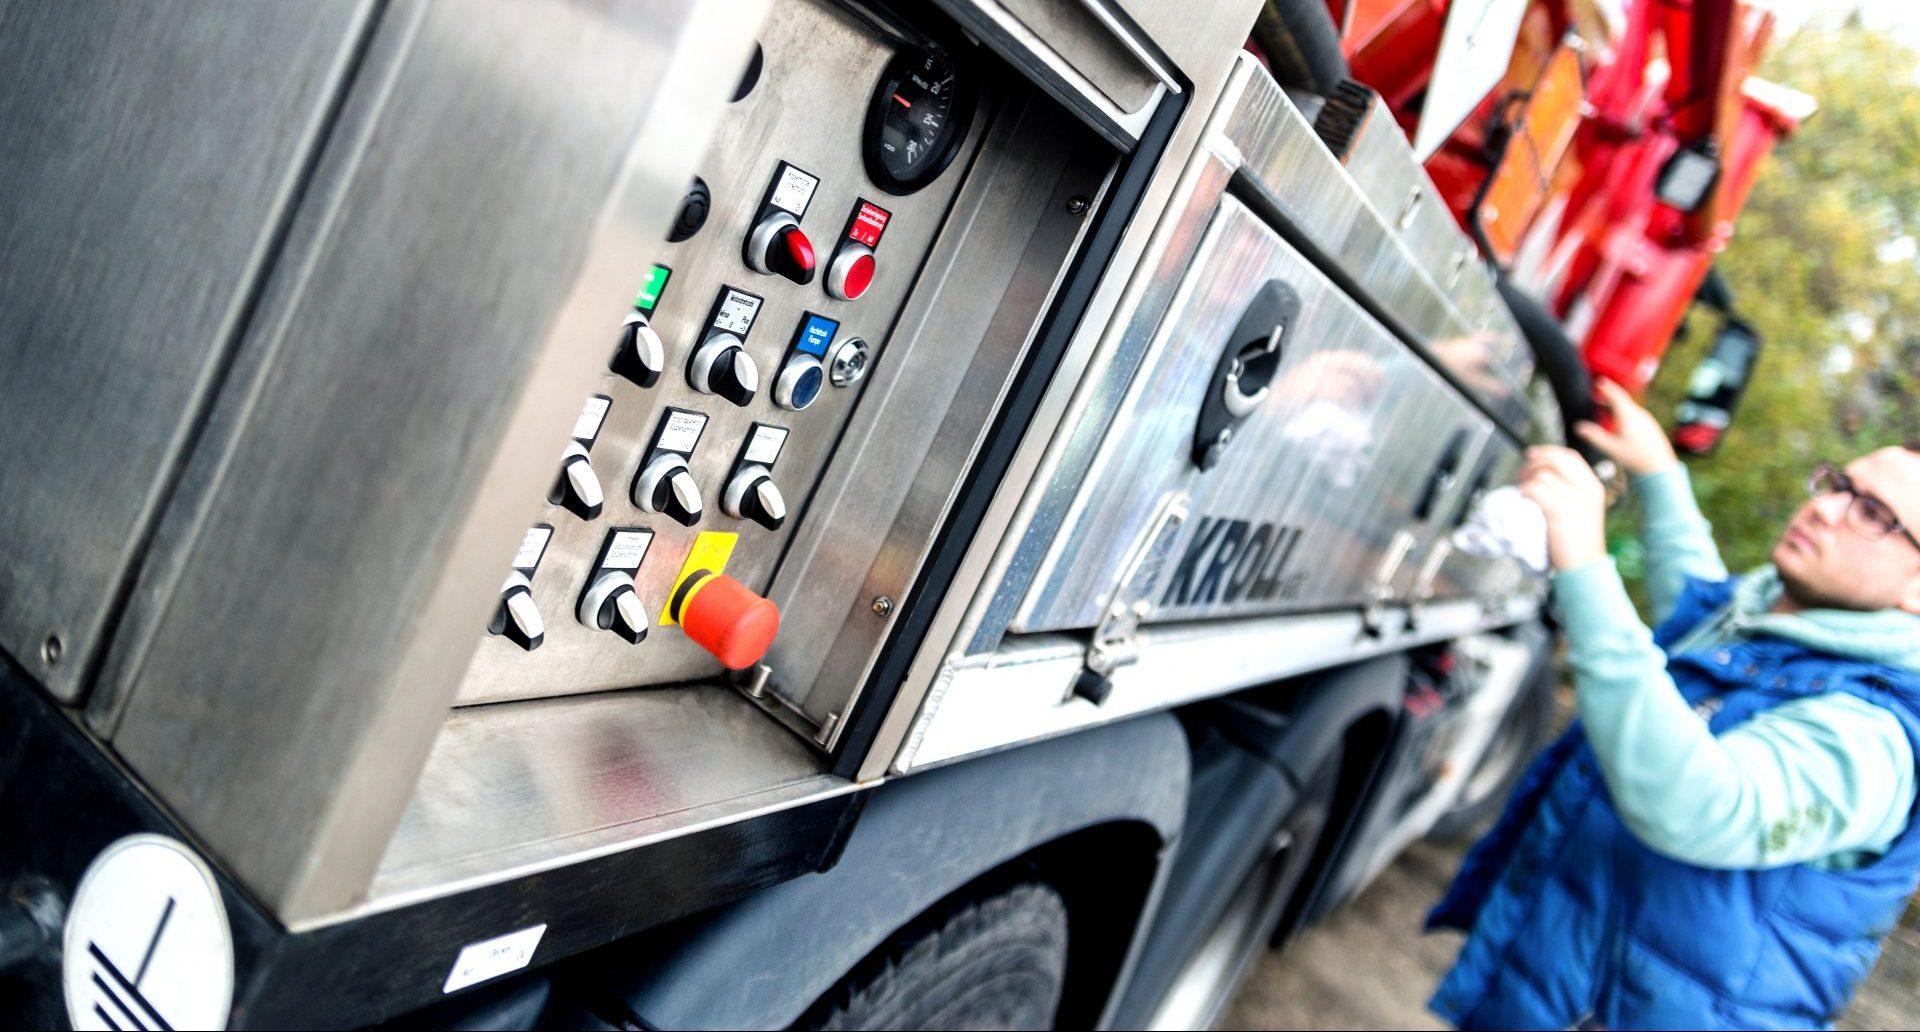 Bedienelemente Saug-/Druckfahrzeug